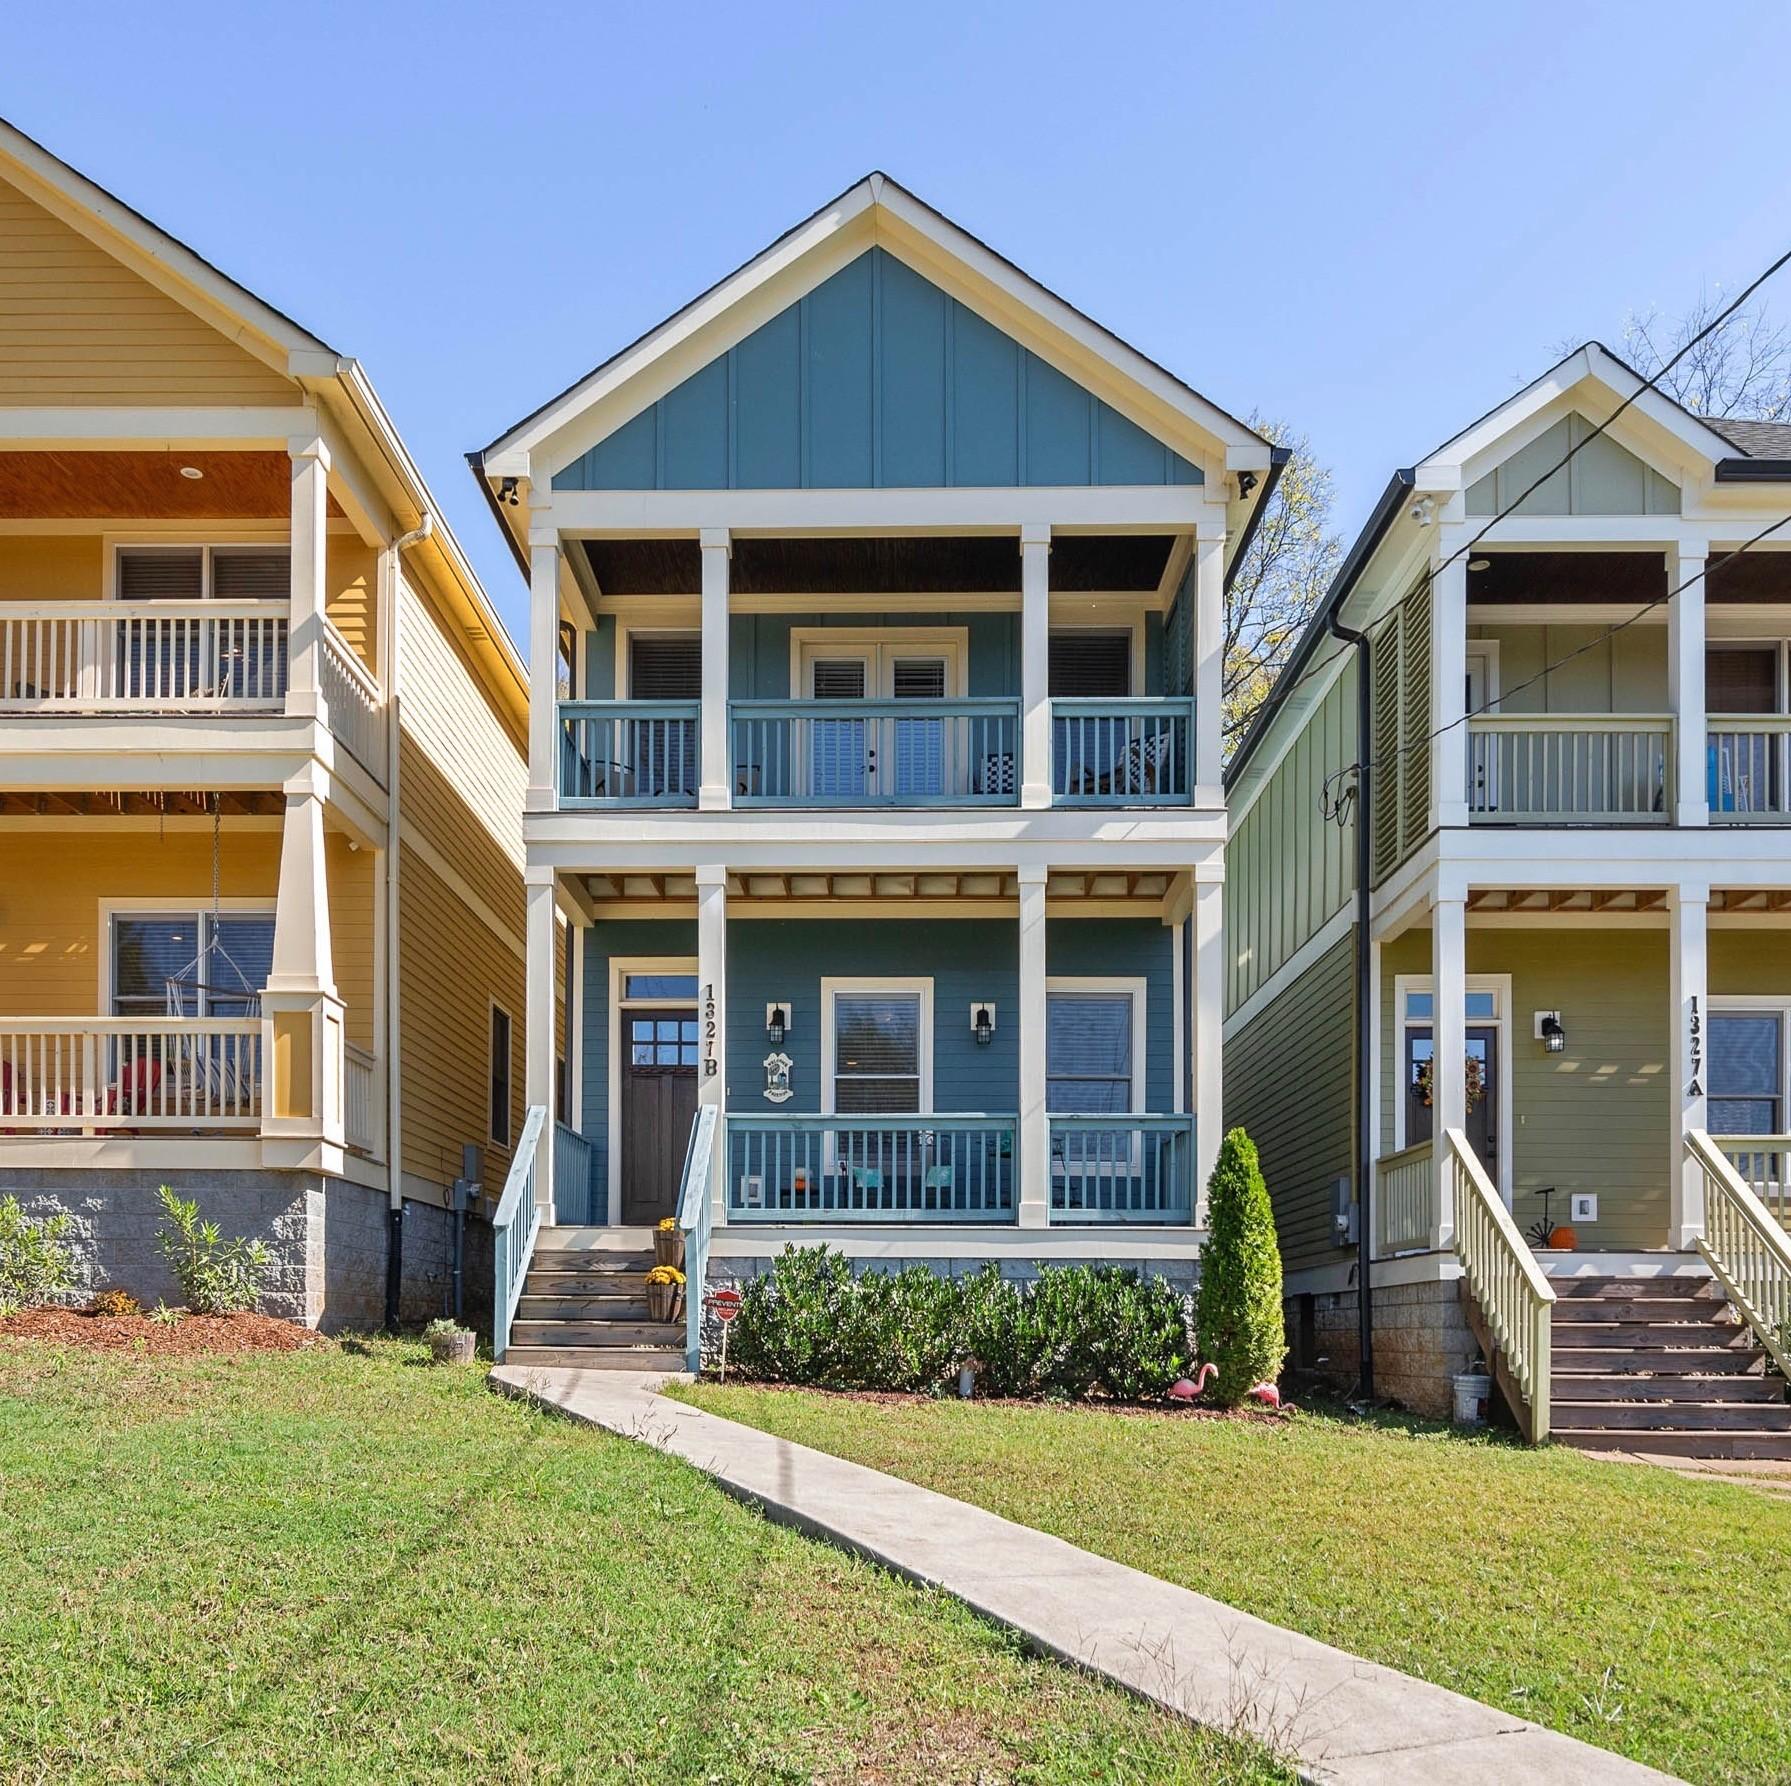 1327B Meridian St, Nashville, TN 37207 - Nashville, TN real estate listing